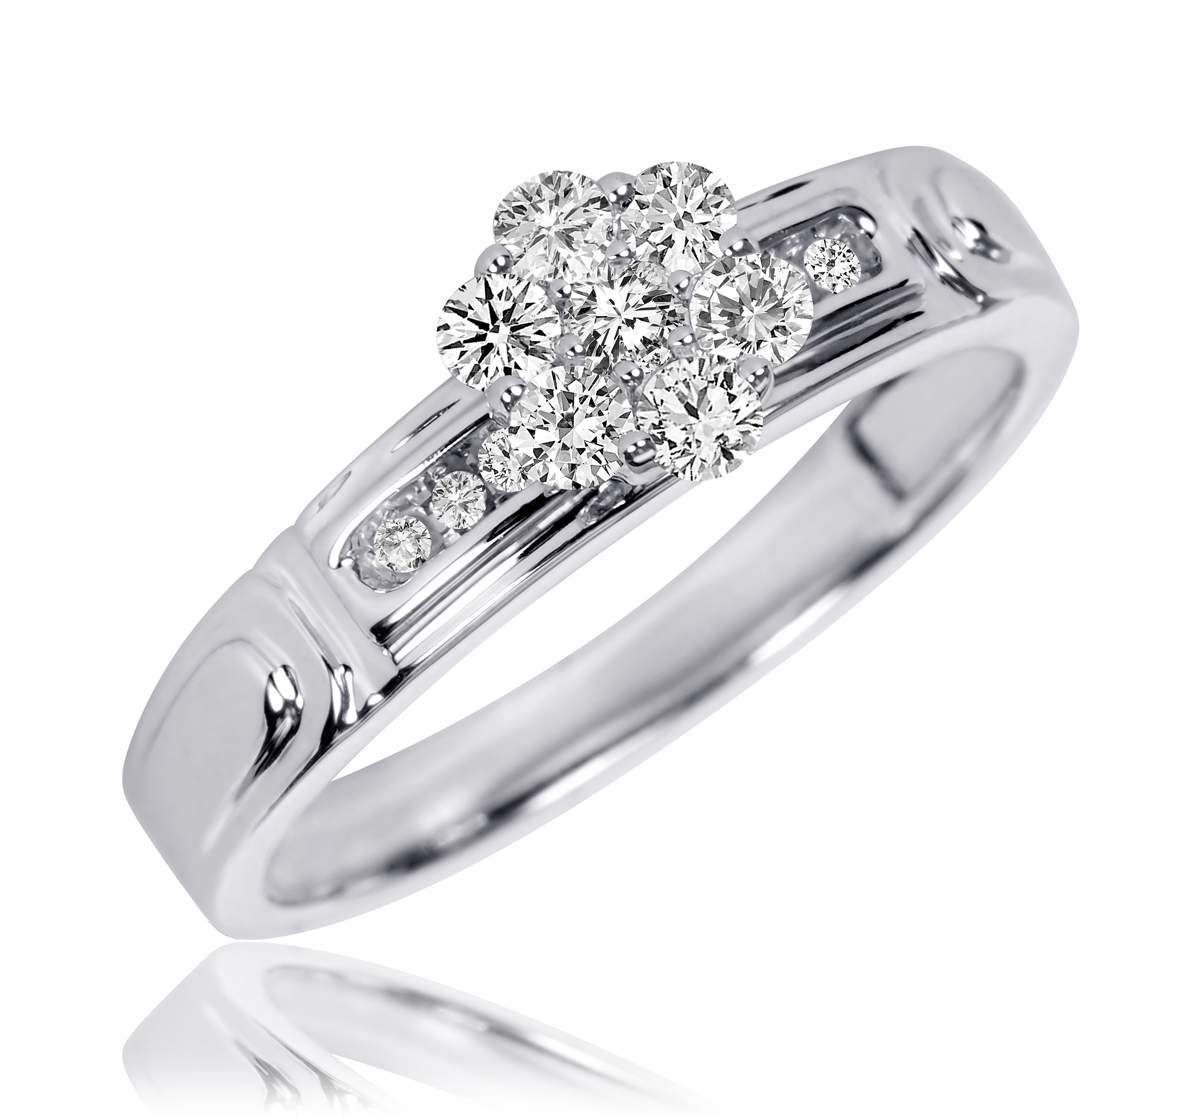 1/3 CT. T.W. Round Cut Diamond Ladies Engagement Ring 10K White Gold- Size 8